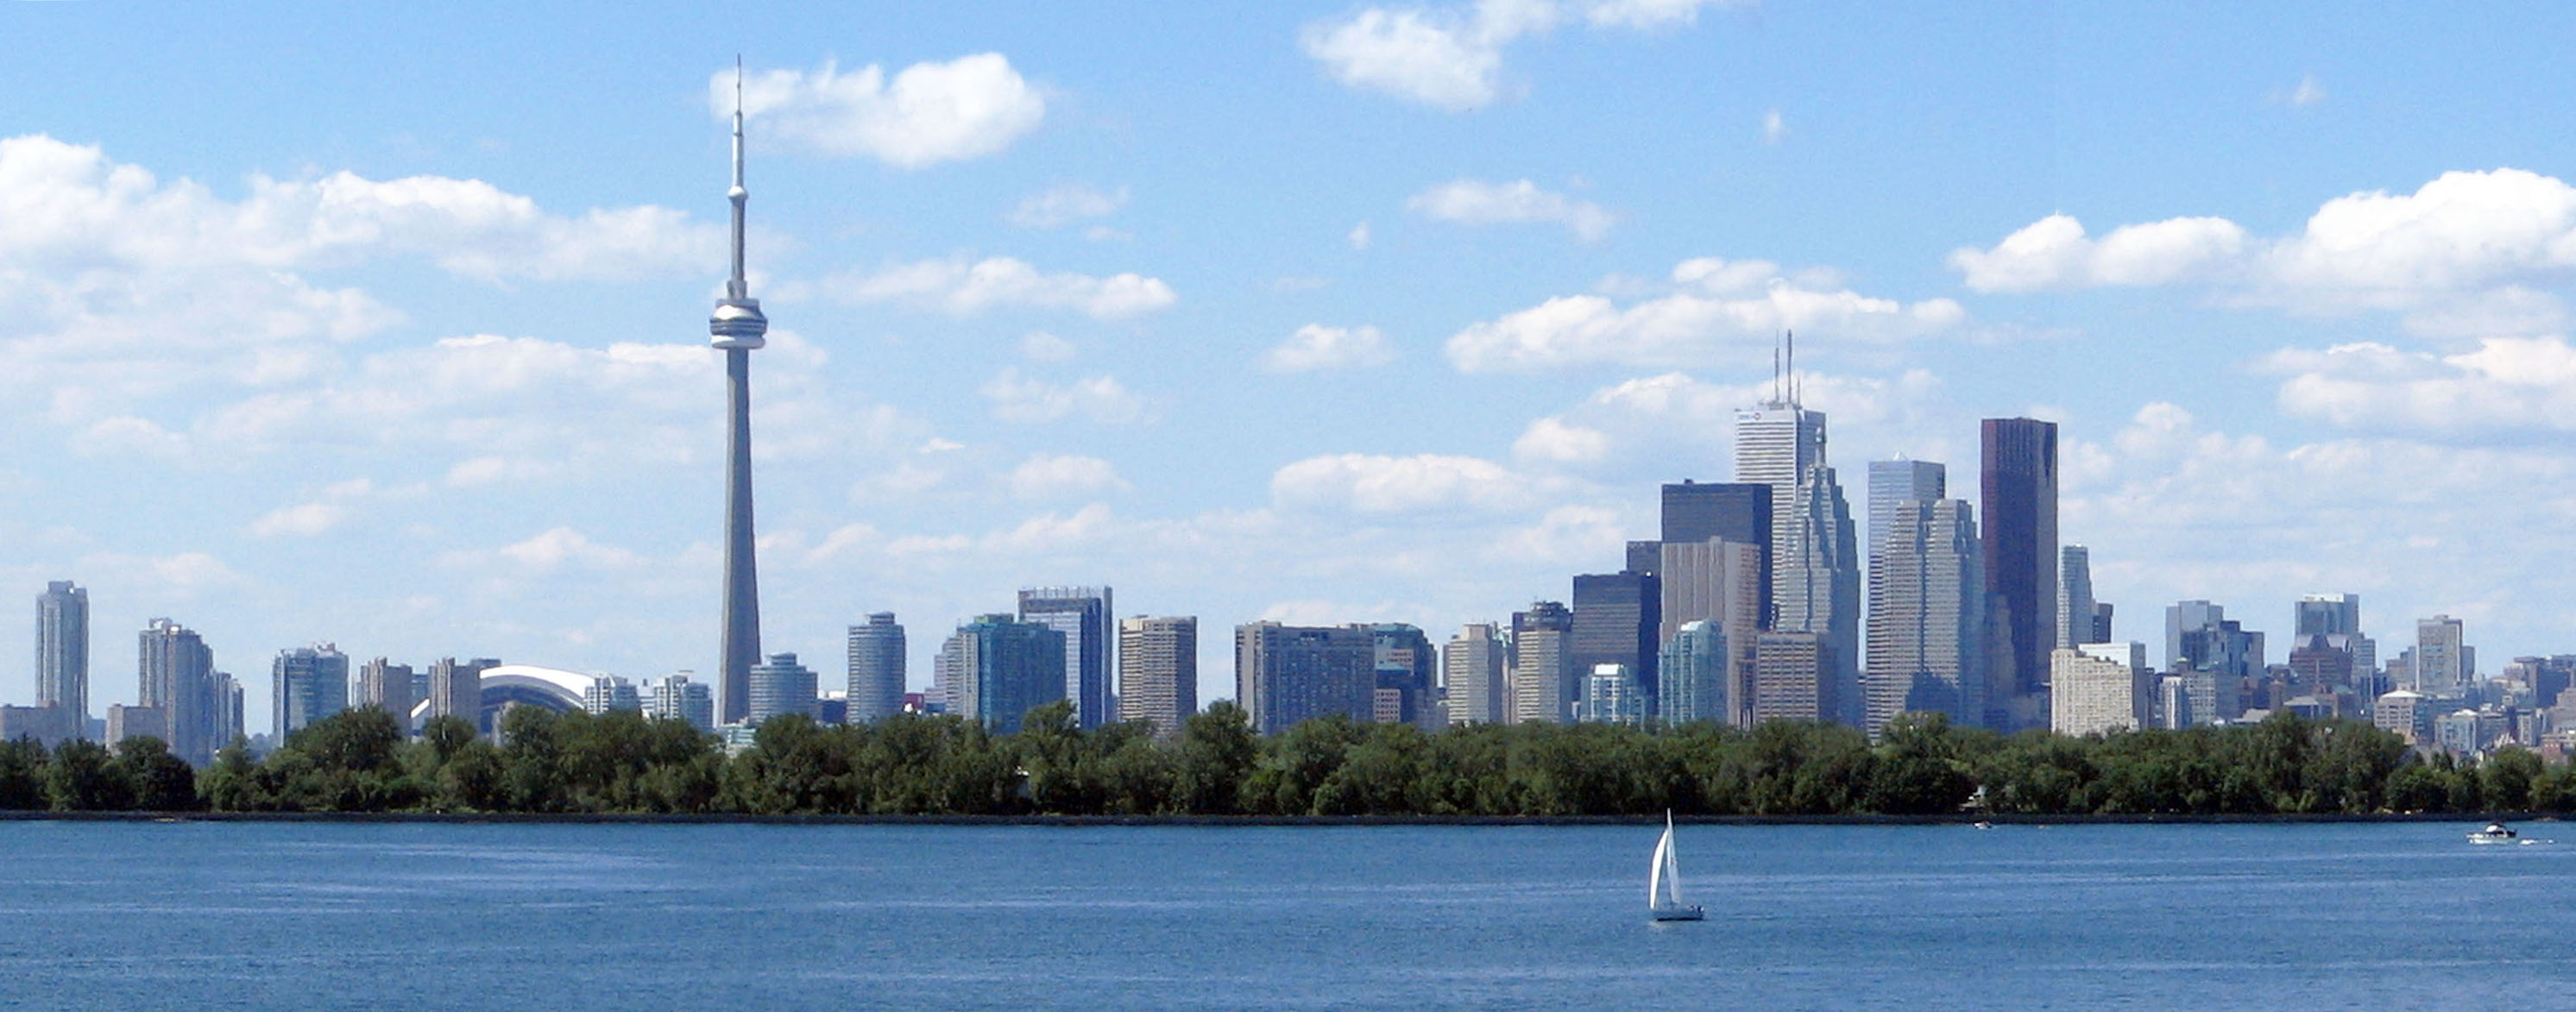 L'Amérique - Page 2 Toronto_skyline_tommythompsonpark_cropped